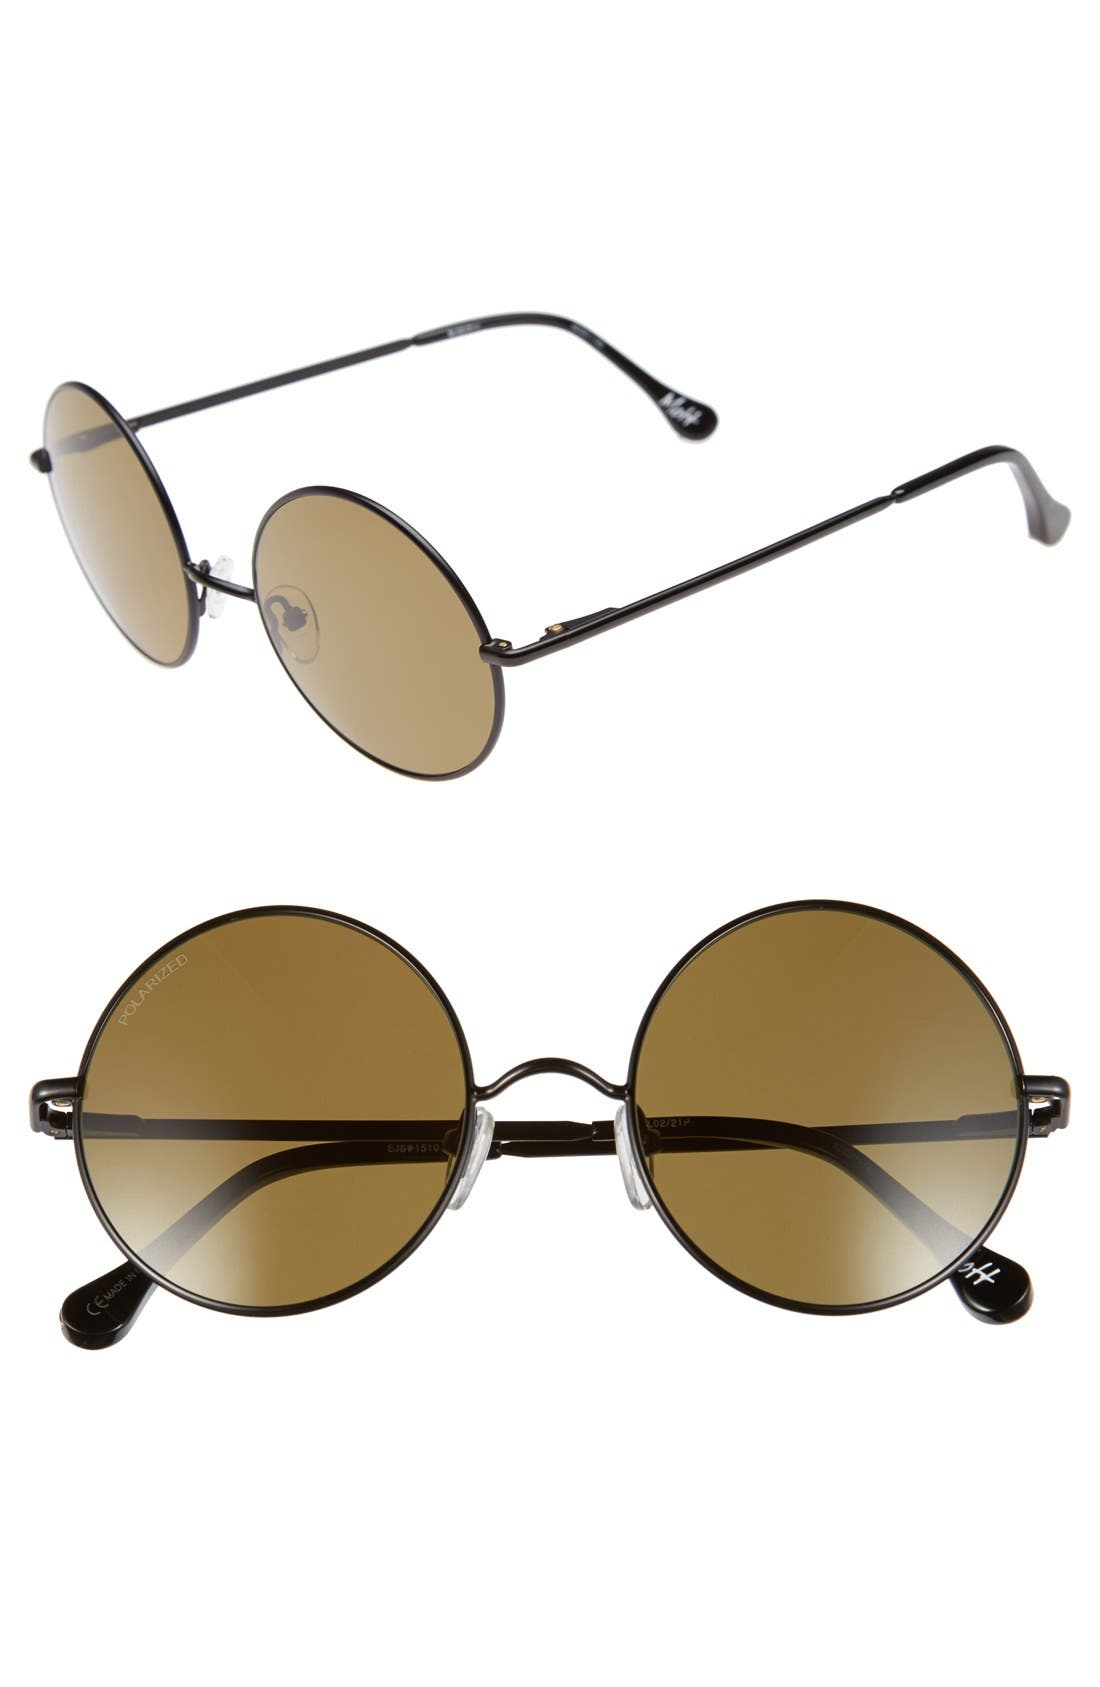 ELIZABETH AND JAMES 'Mott' 52mm Round Sunglasses, Main, color, 001